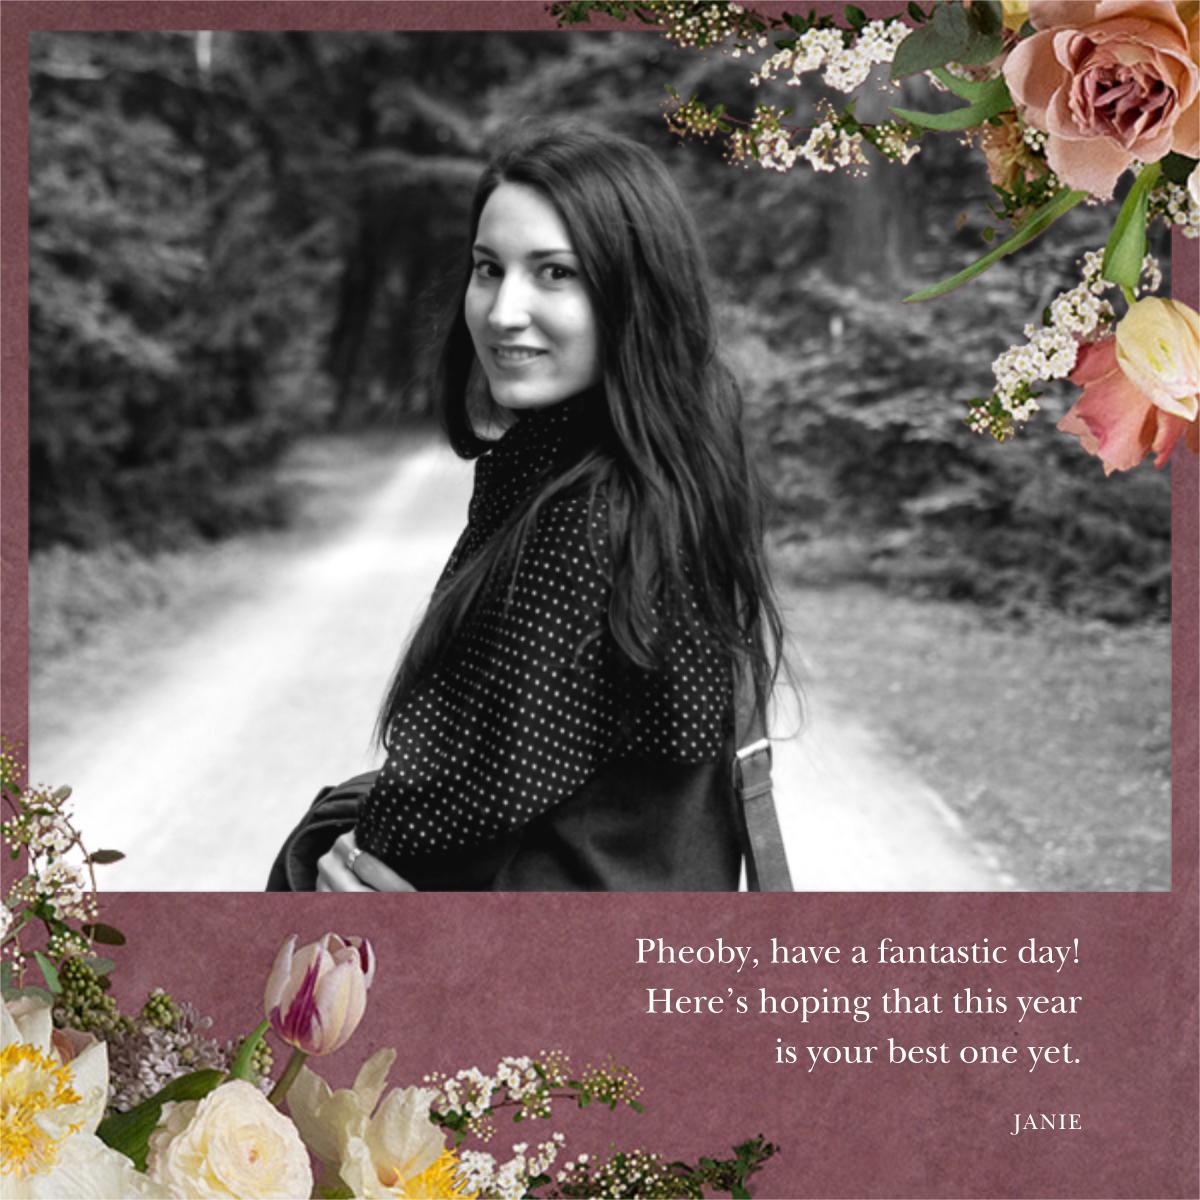 Messidor Photo - Putnam & Putnam - Greeting cards